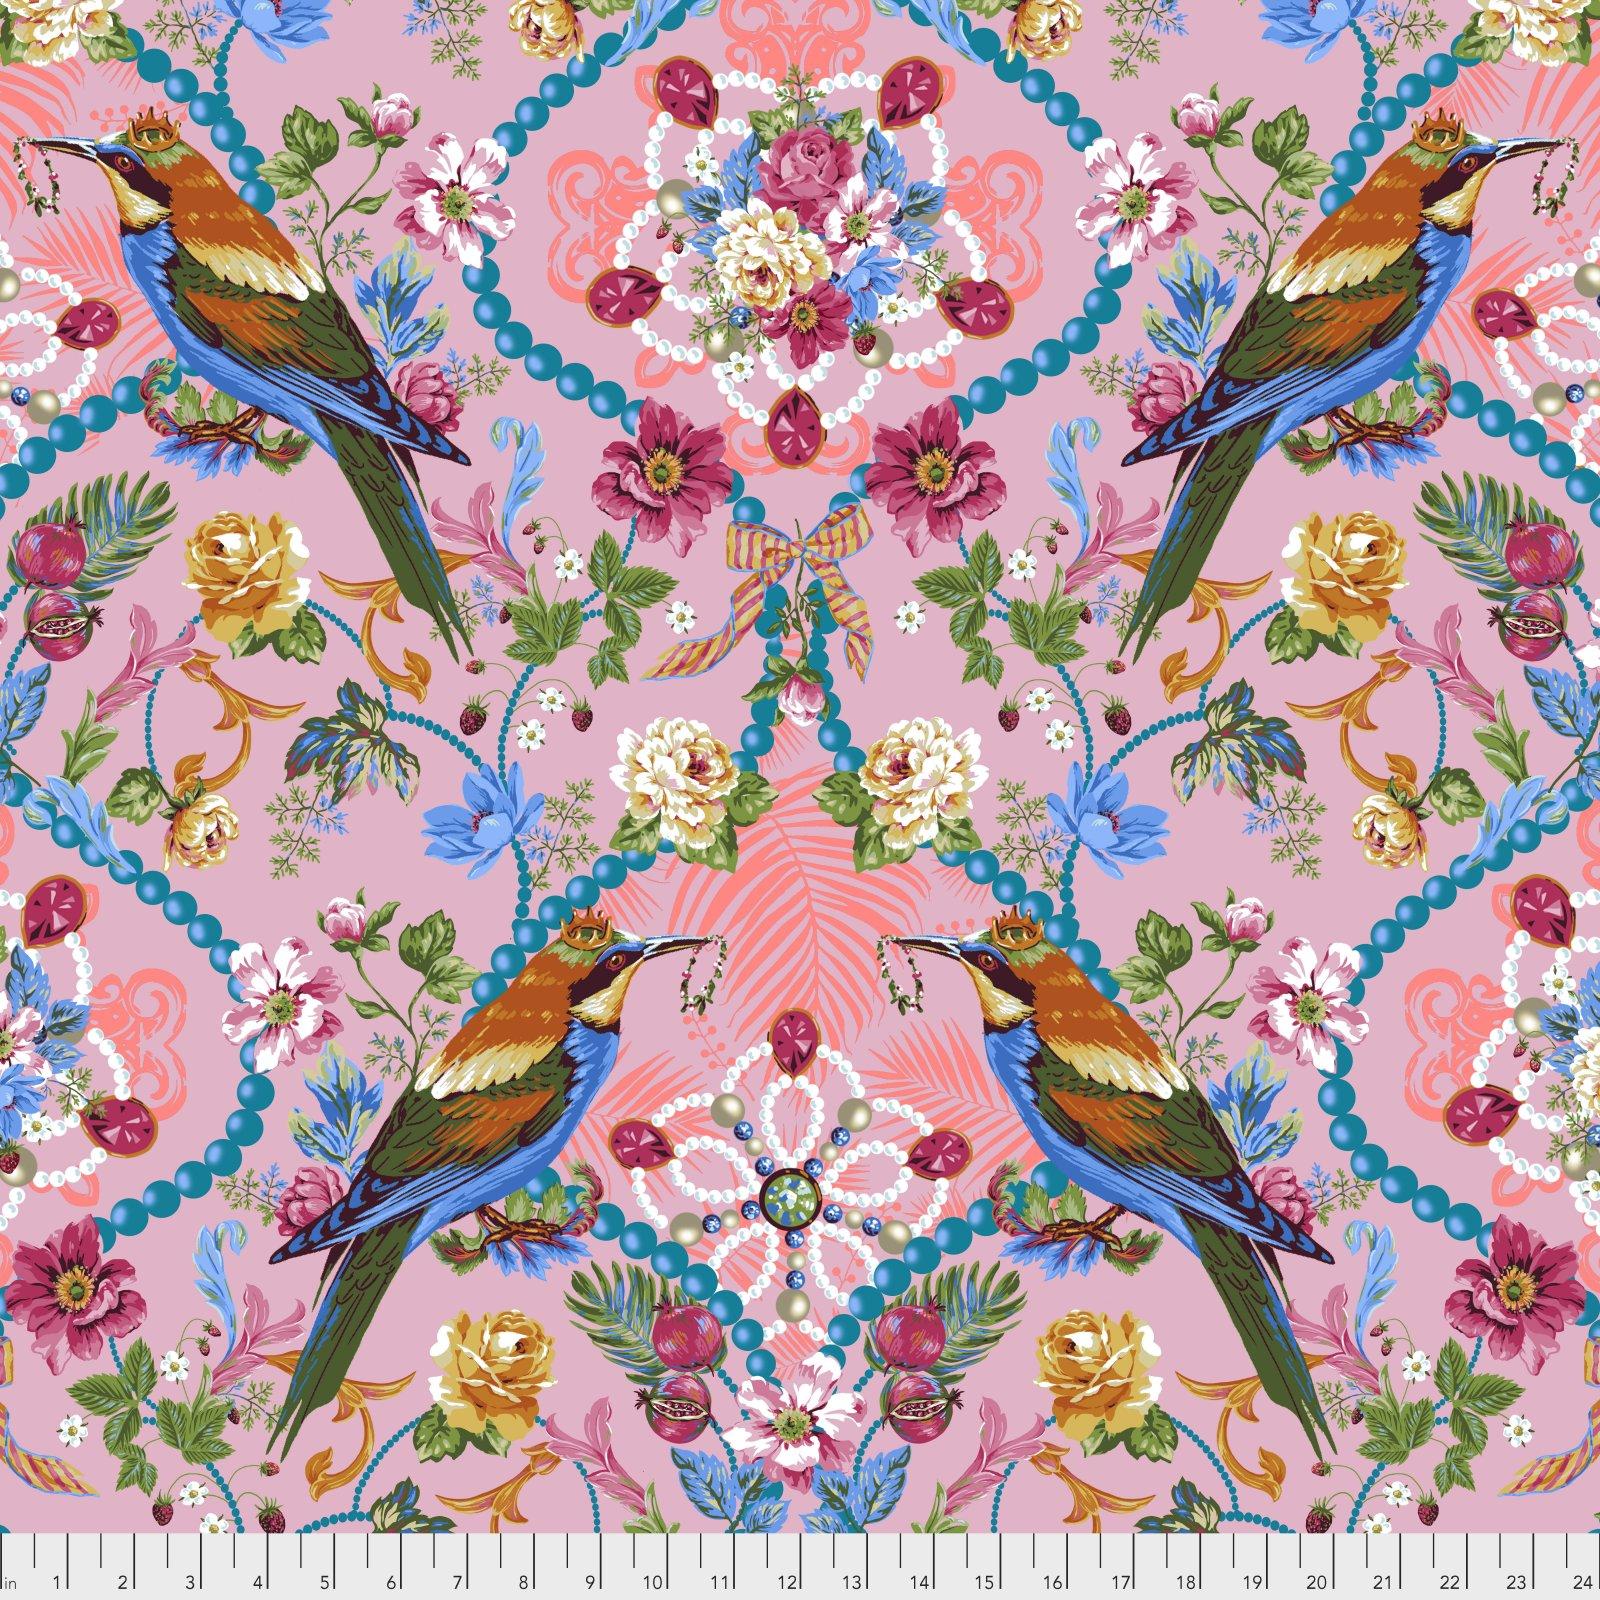 Jardin de la Reine by Odile Bailloeul for Free Spirit Fabrics - The Queen's Jewels - Rose